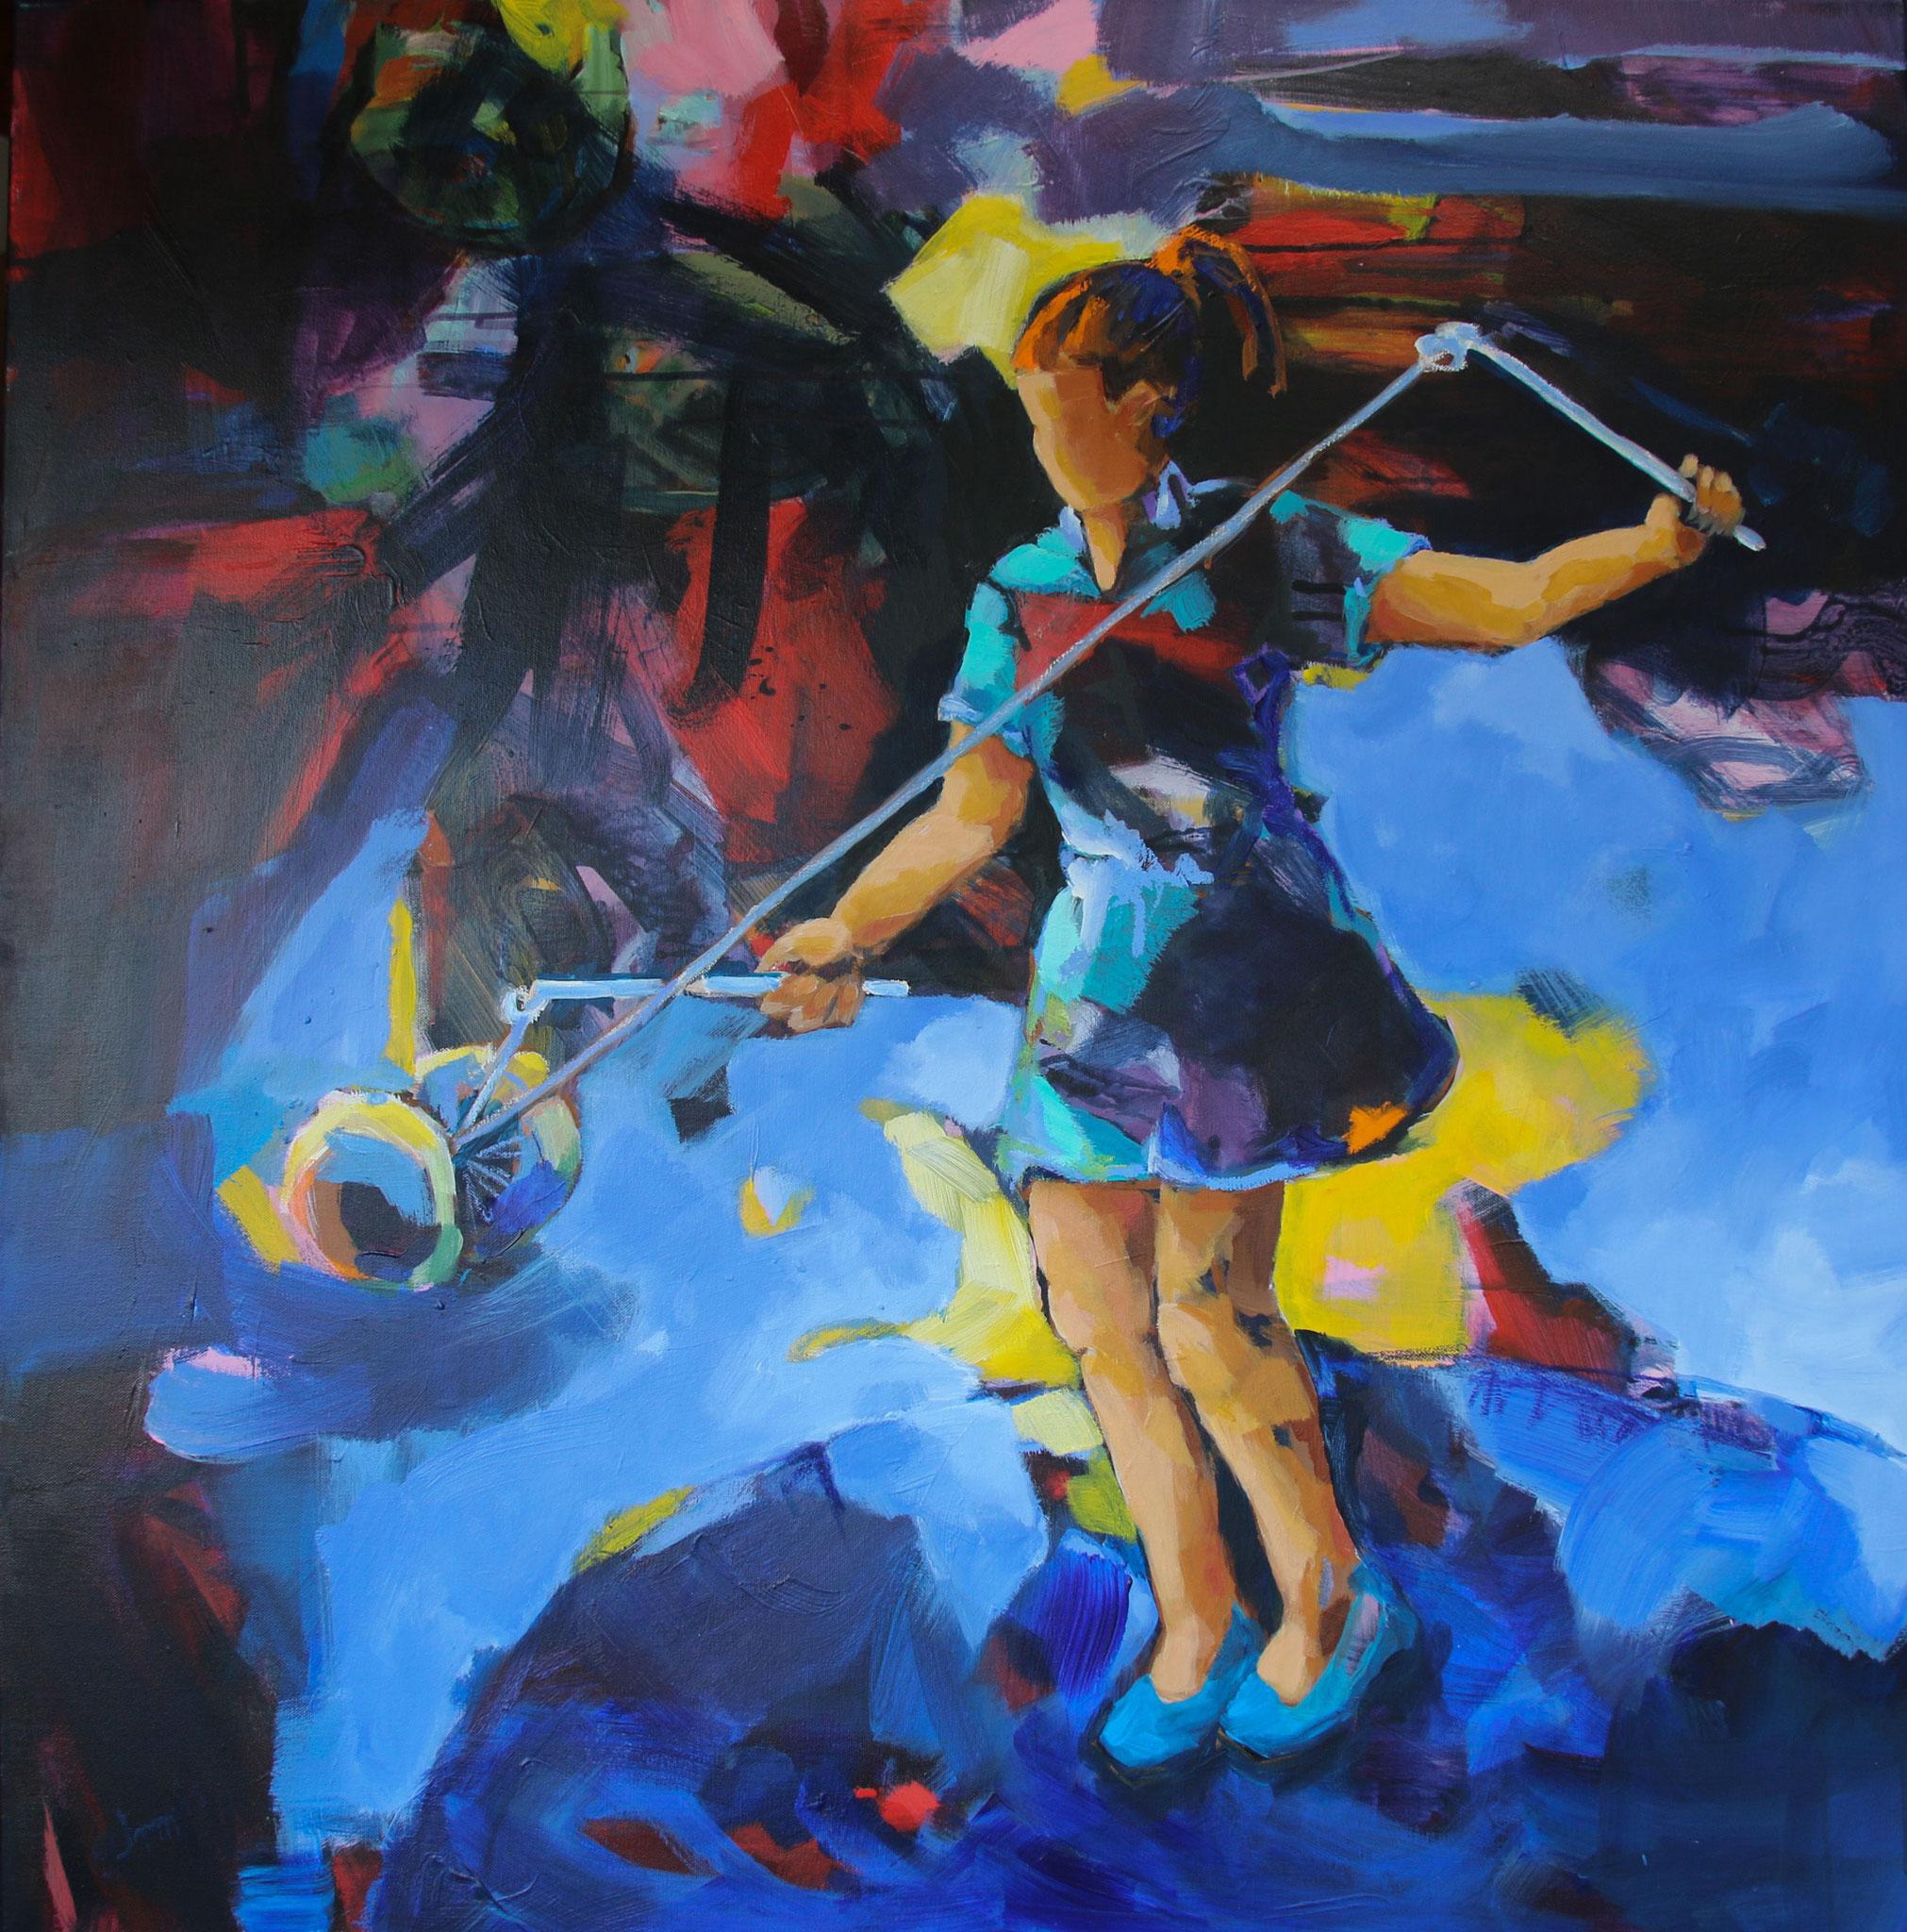 Diabolo 1, 2018, Acryl auf Leinwand, 100 x 100 cm